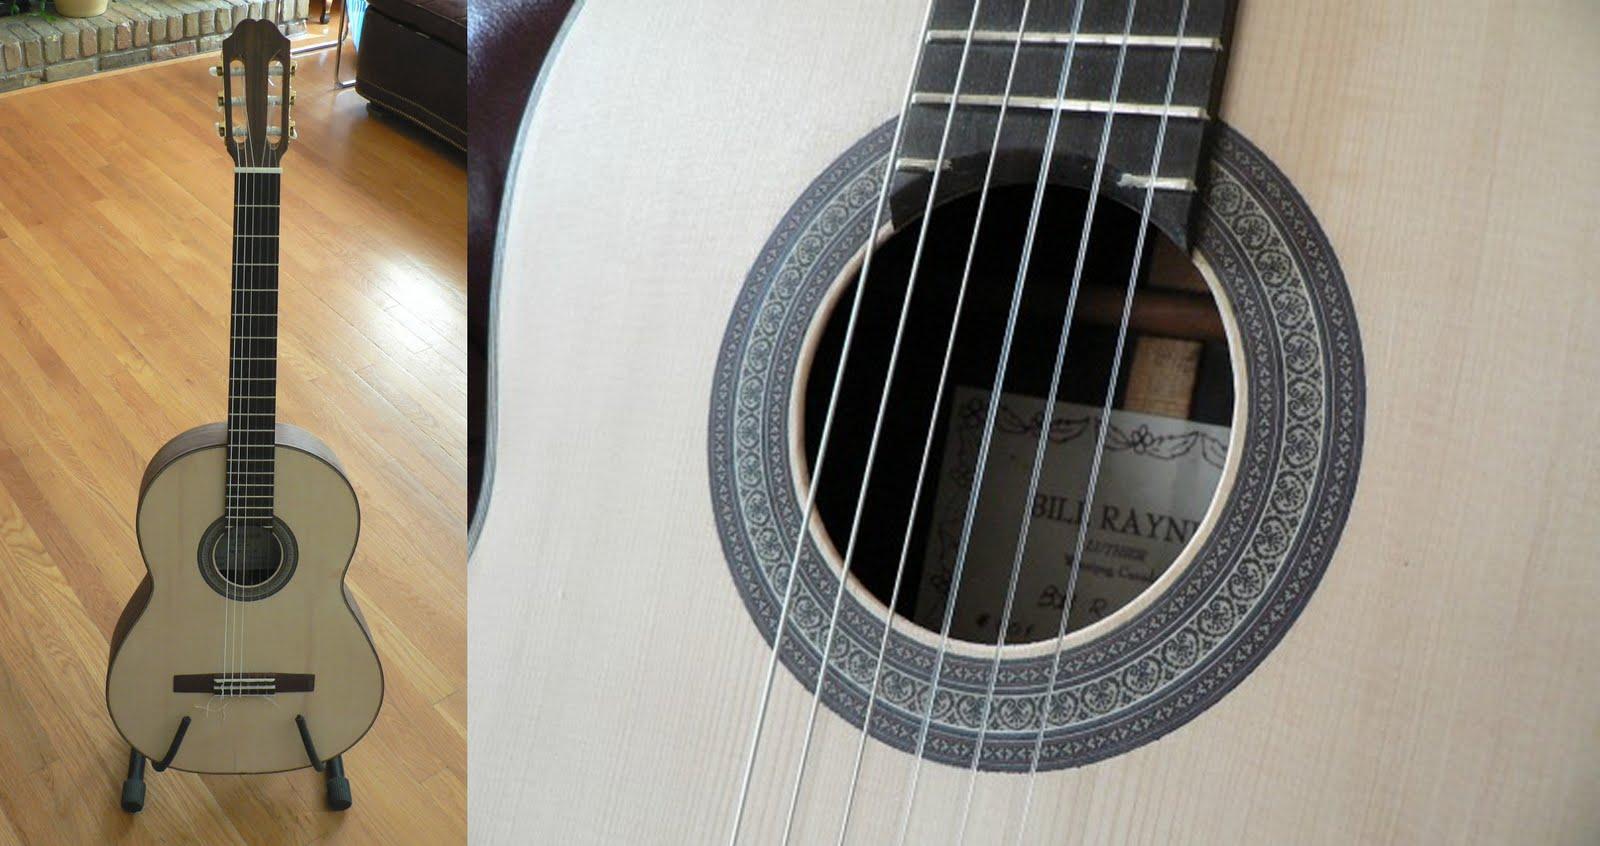 Bill rayner luthier classical guitar ukulele - Cocobolo granada ...